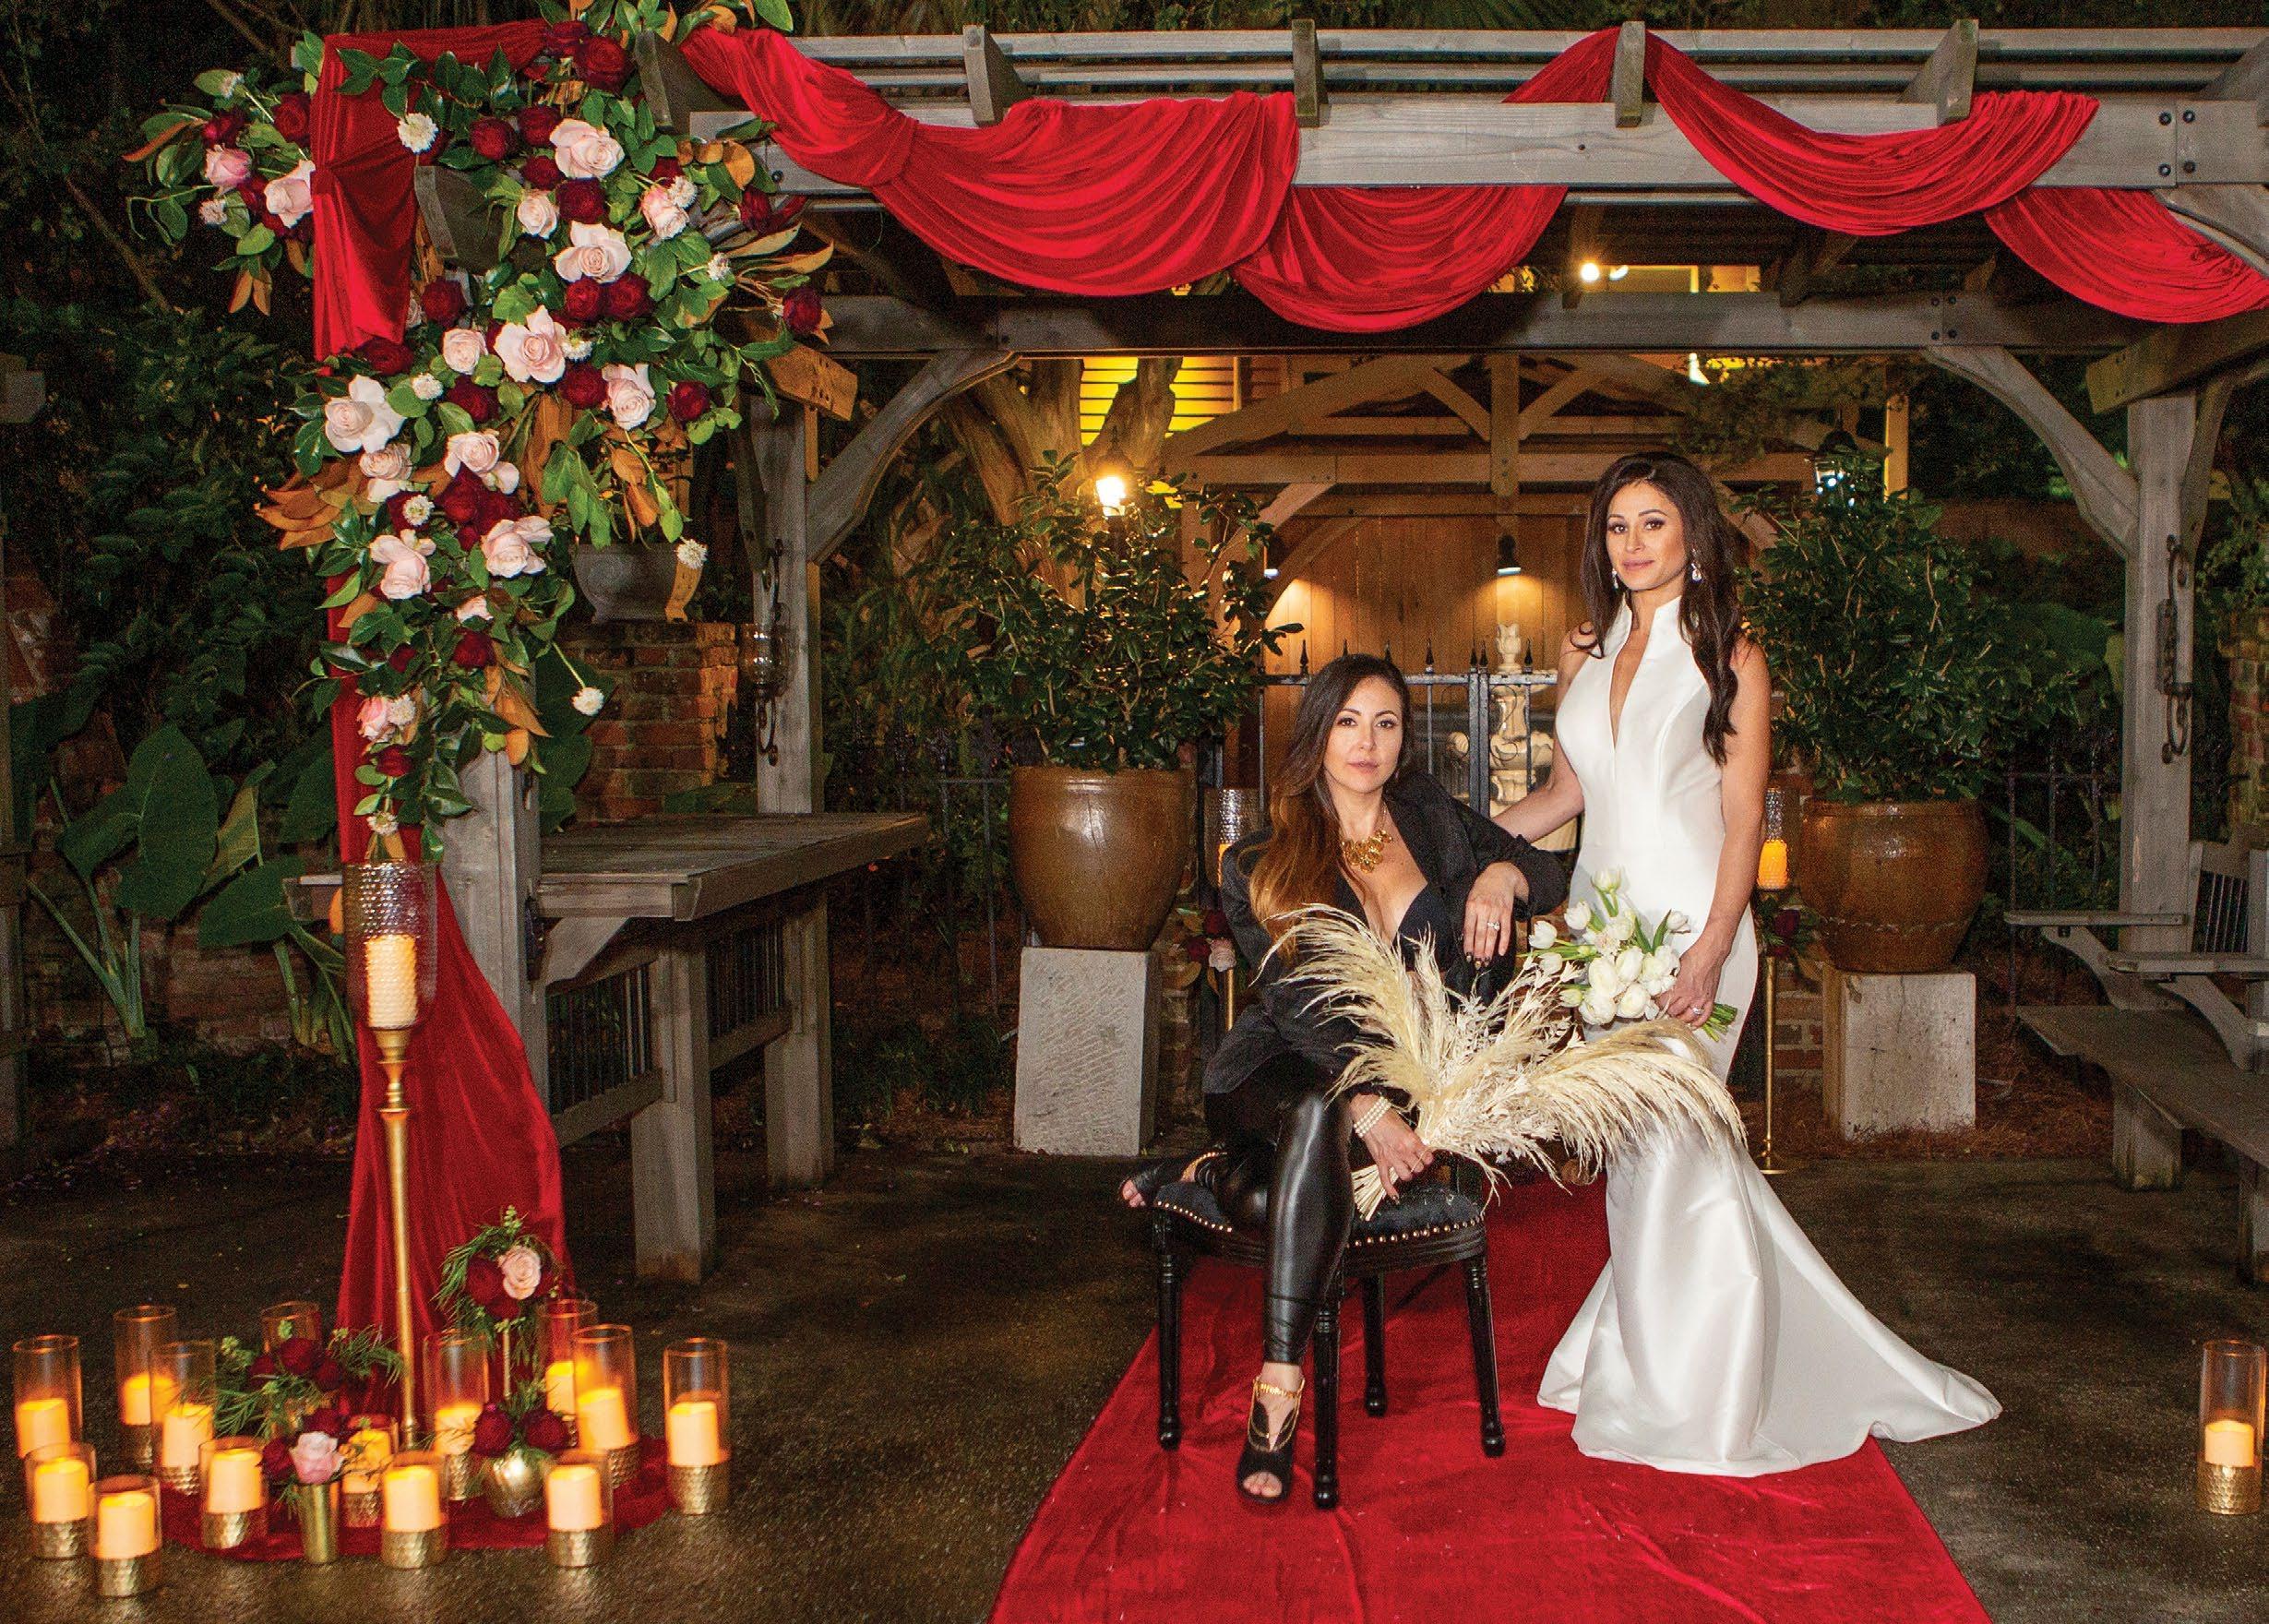 Page 14 of WEDDING WEEKEND MINIMONY IN NOLA